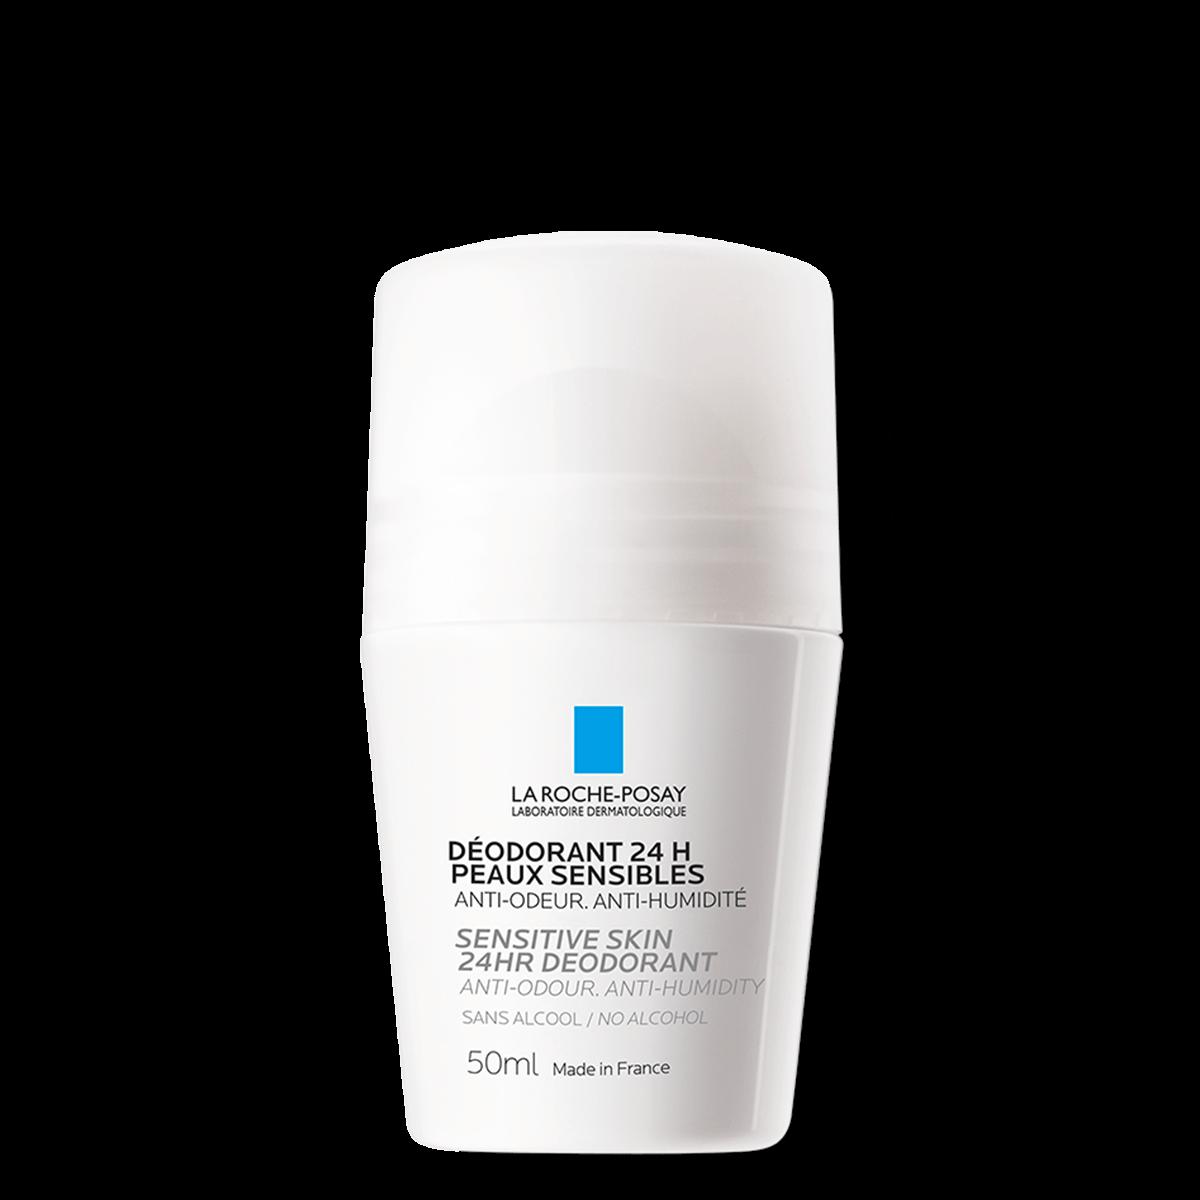 La Roche Posay Fyziologický deodorant Roll-on 24h 50ml 3337872412158